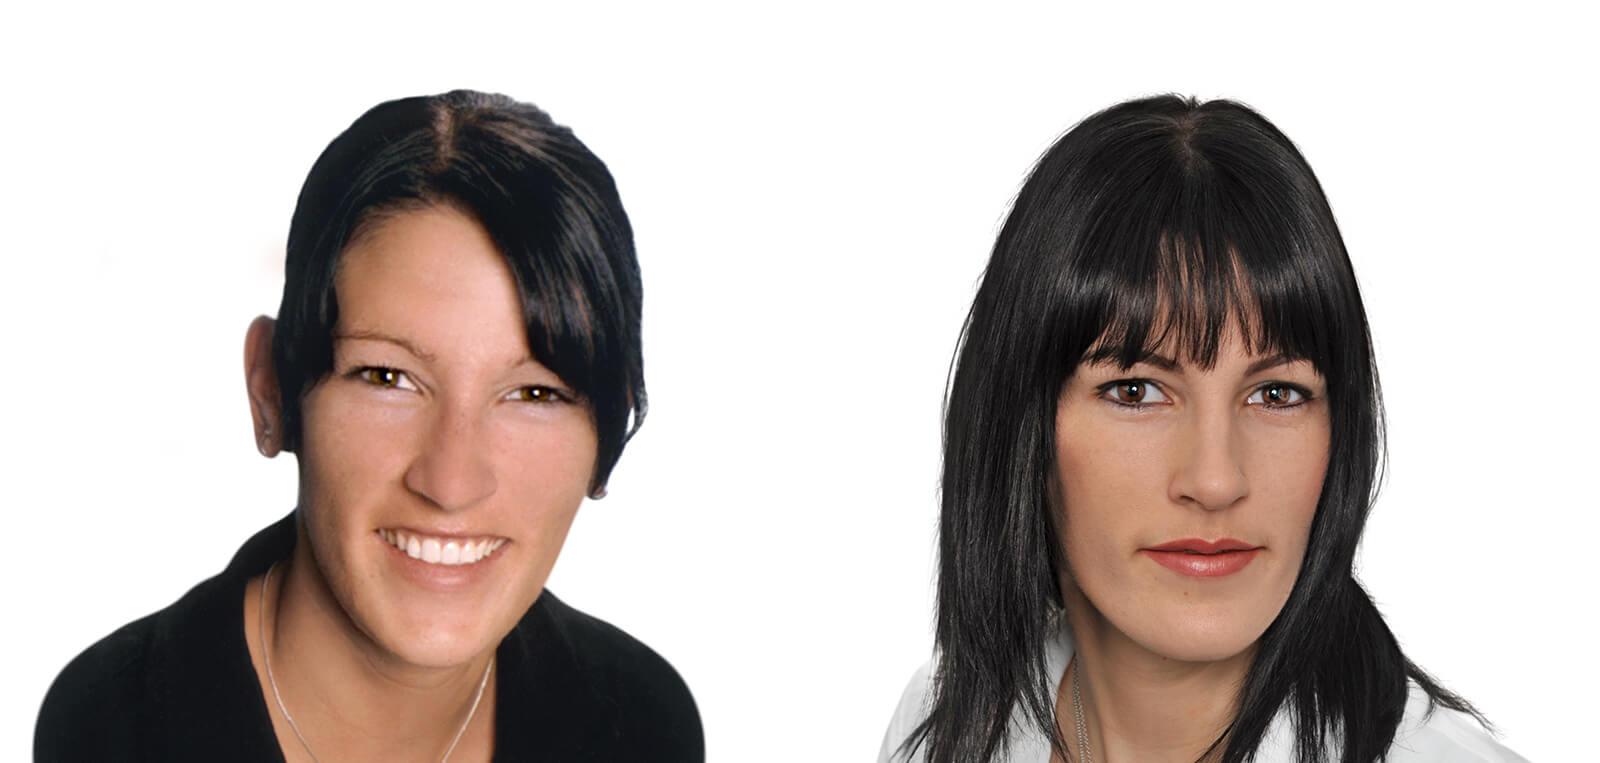 Permanent Make-Up vorher/nachher komplett Damen 06 | Der Jungbrunnen Aichach